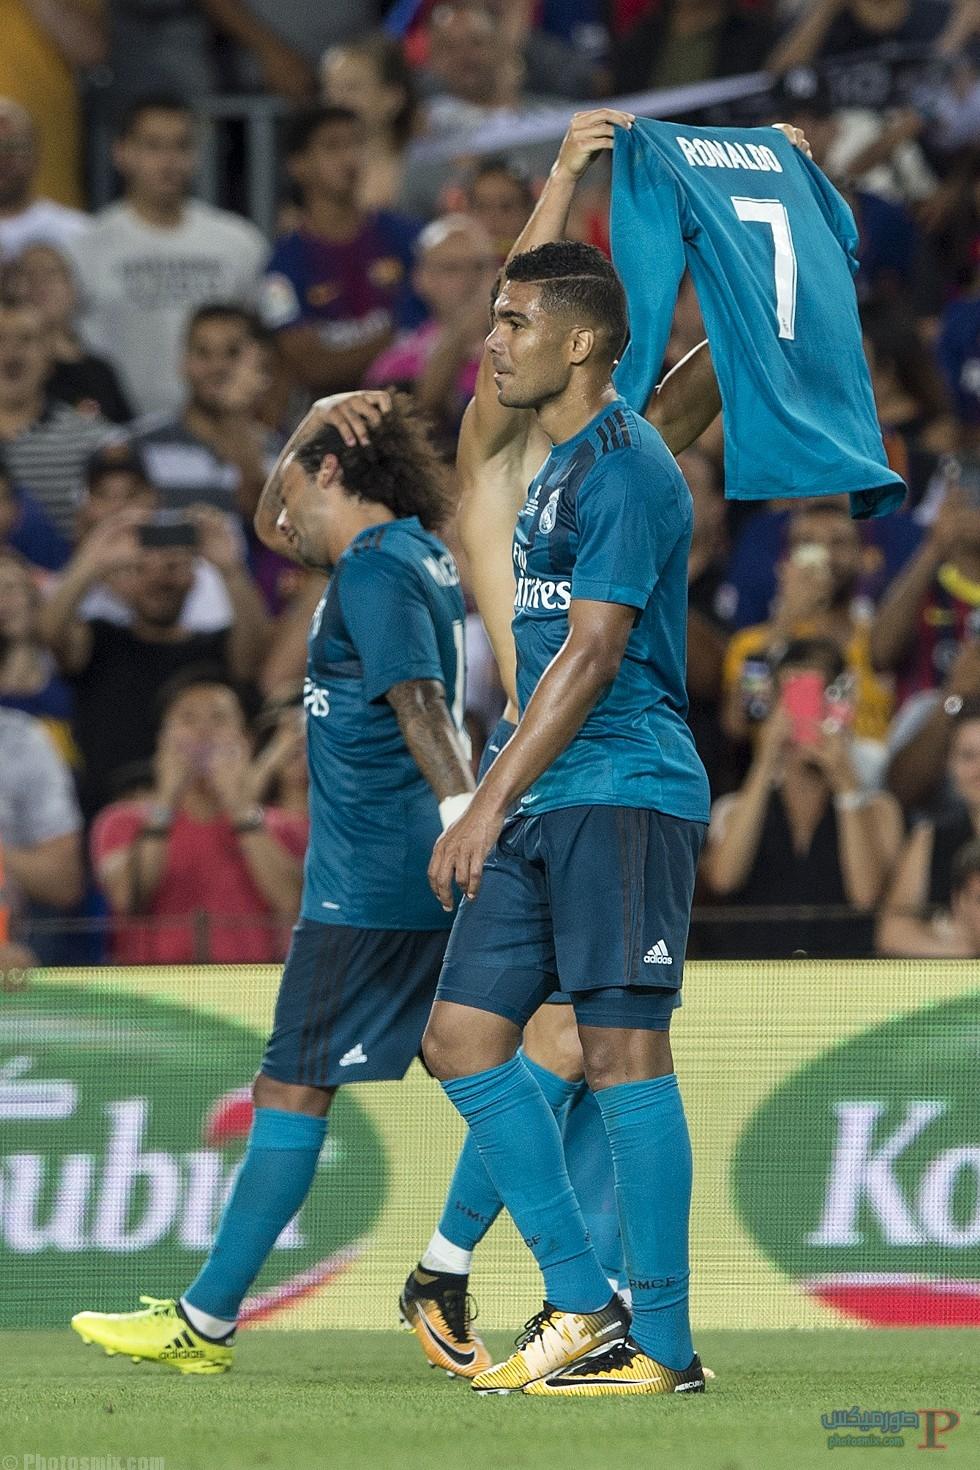 -رصور-رونالدو-بالملعب-6 صور كريستيانو رونالدو , اجمل صور Ronaldo 2018 , خلفيات ورمزيات رونالدو